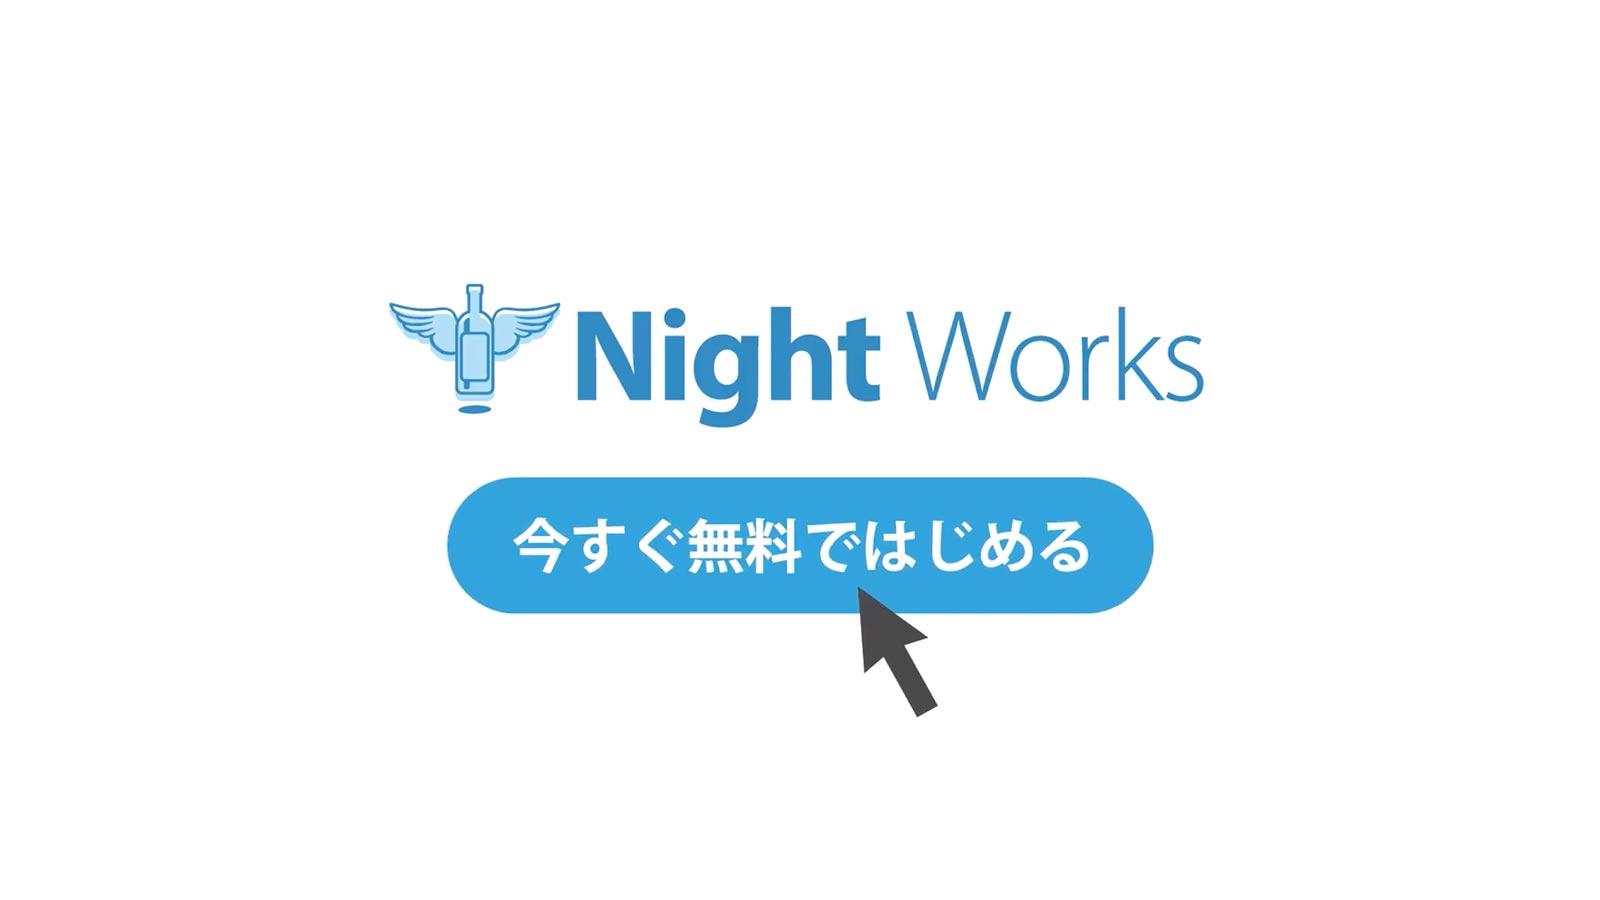 NightWorks